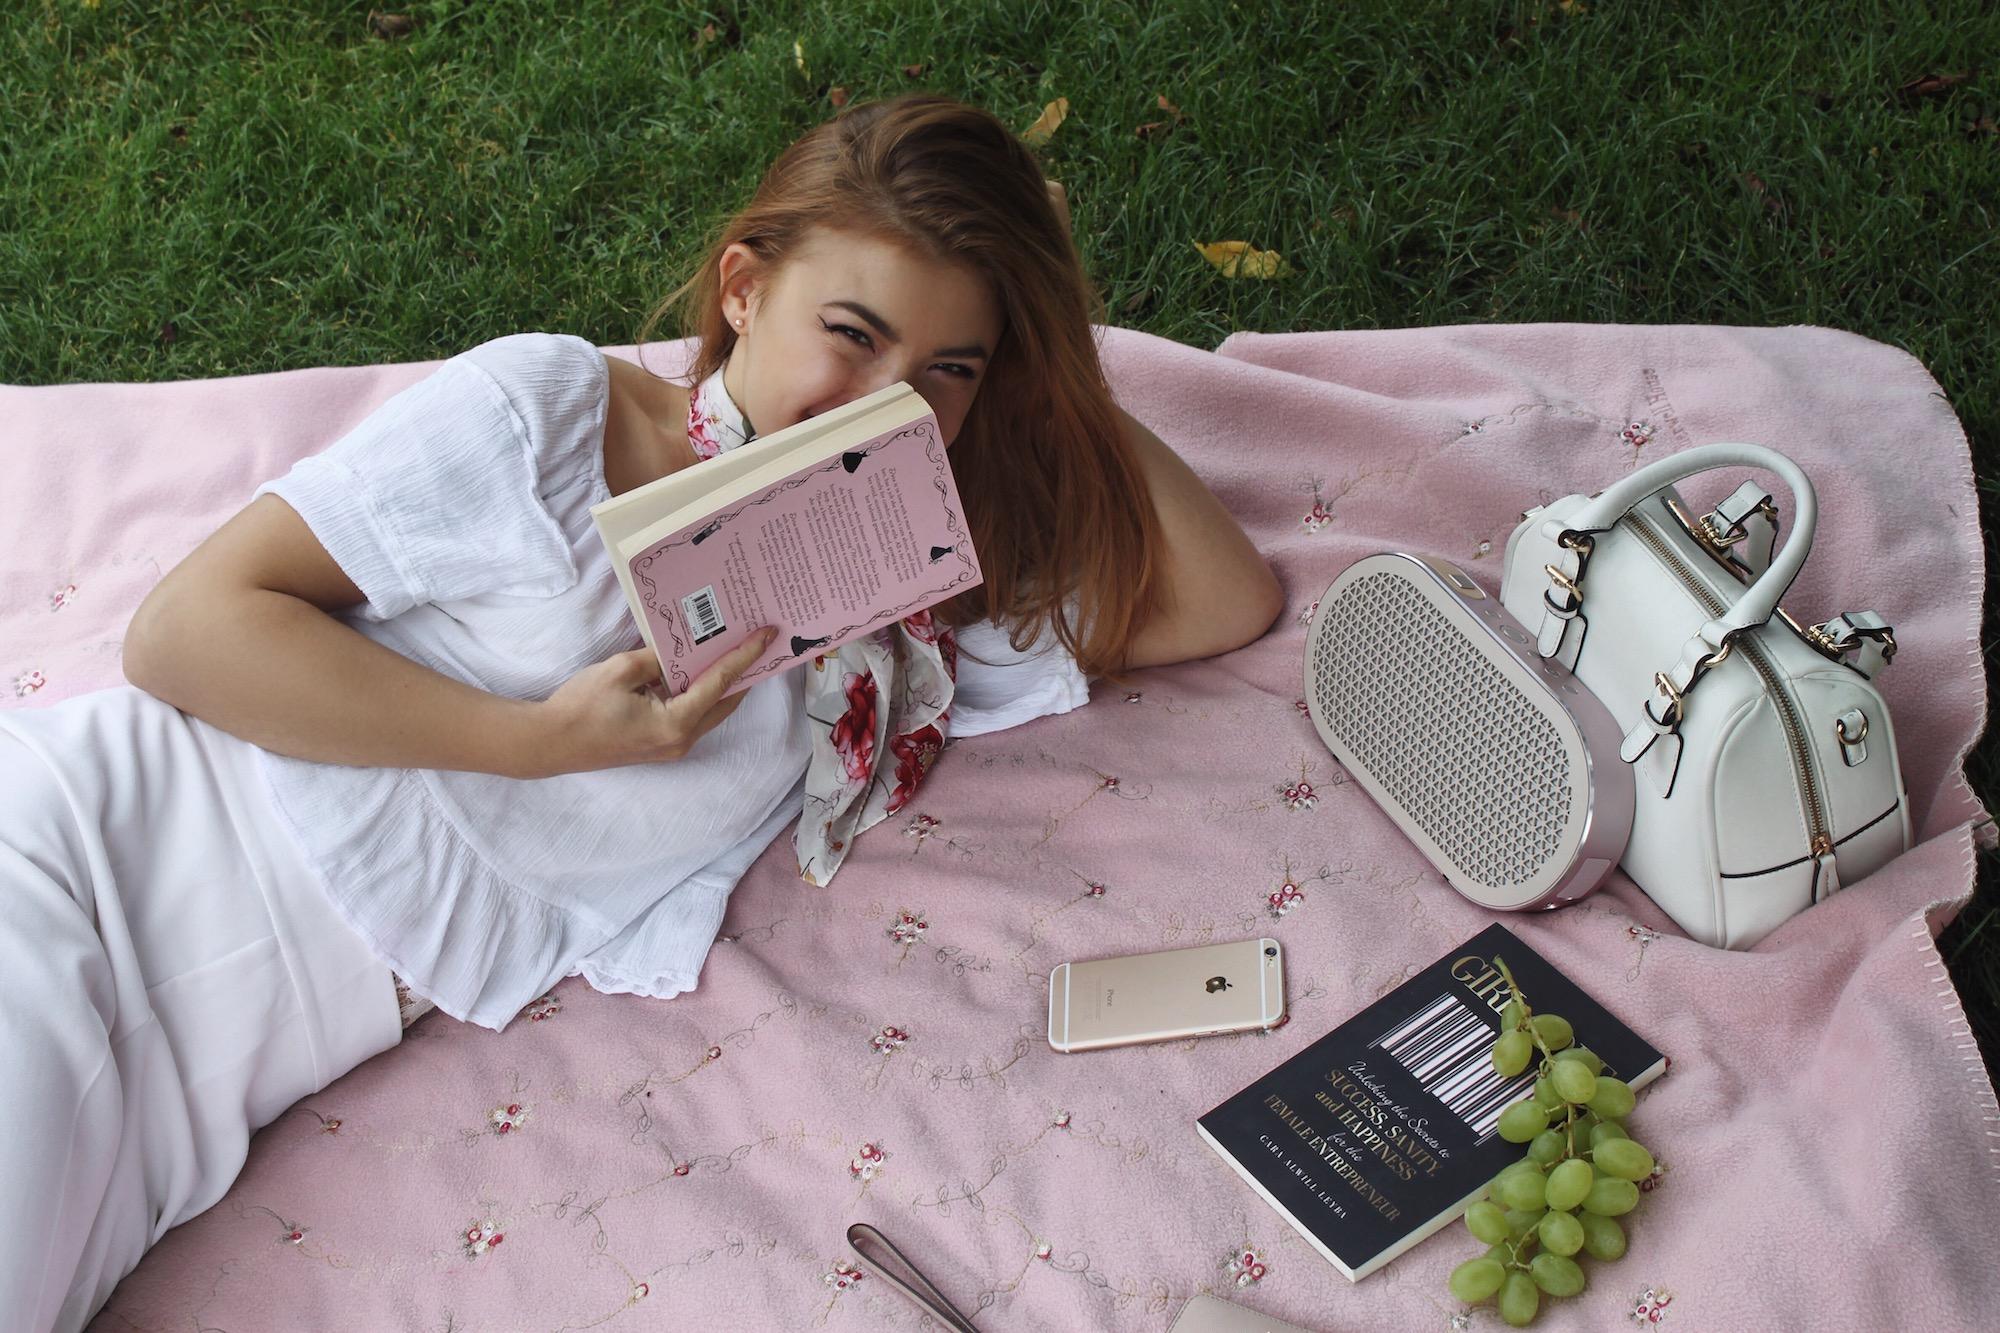 juliana-chow-dali-speakers-play-katch-campaign-instagram-social-technology-fashion-copenhagen-london-blog-blogger9